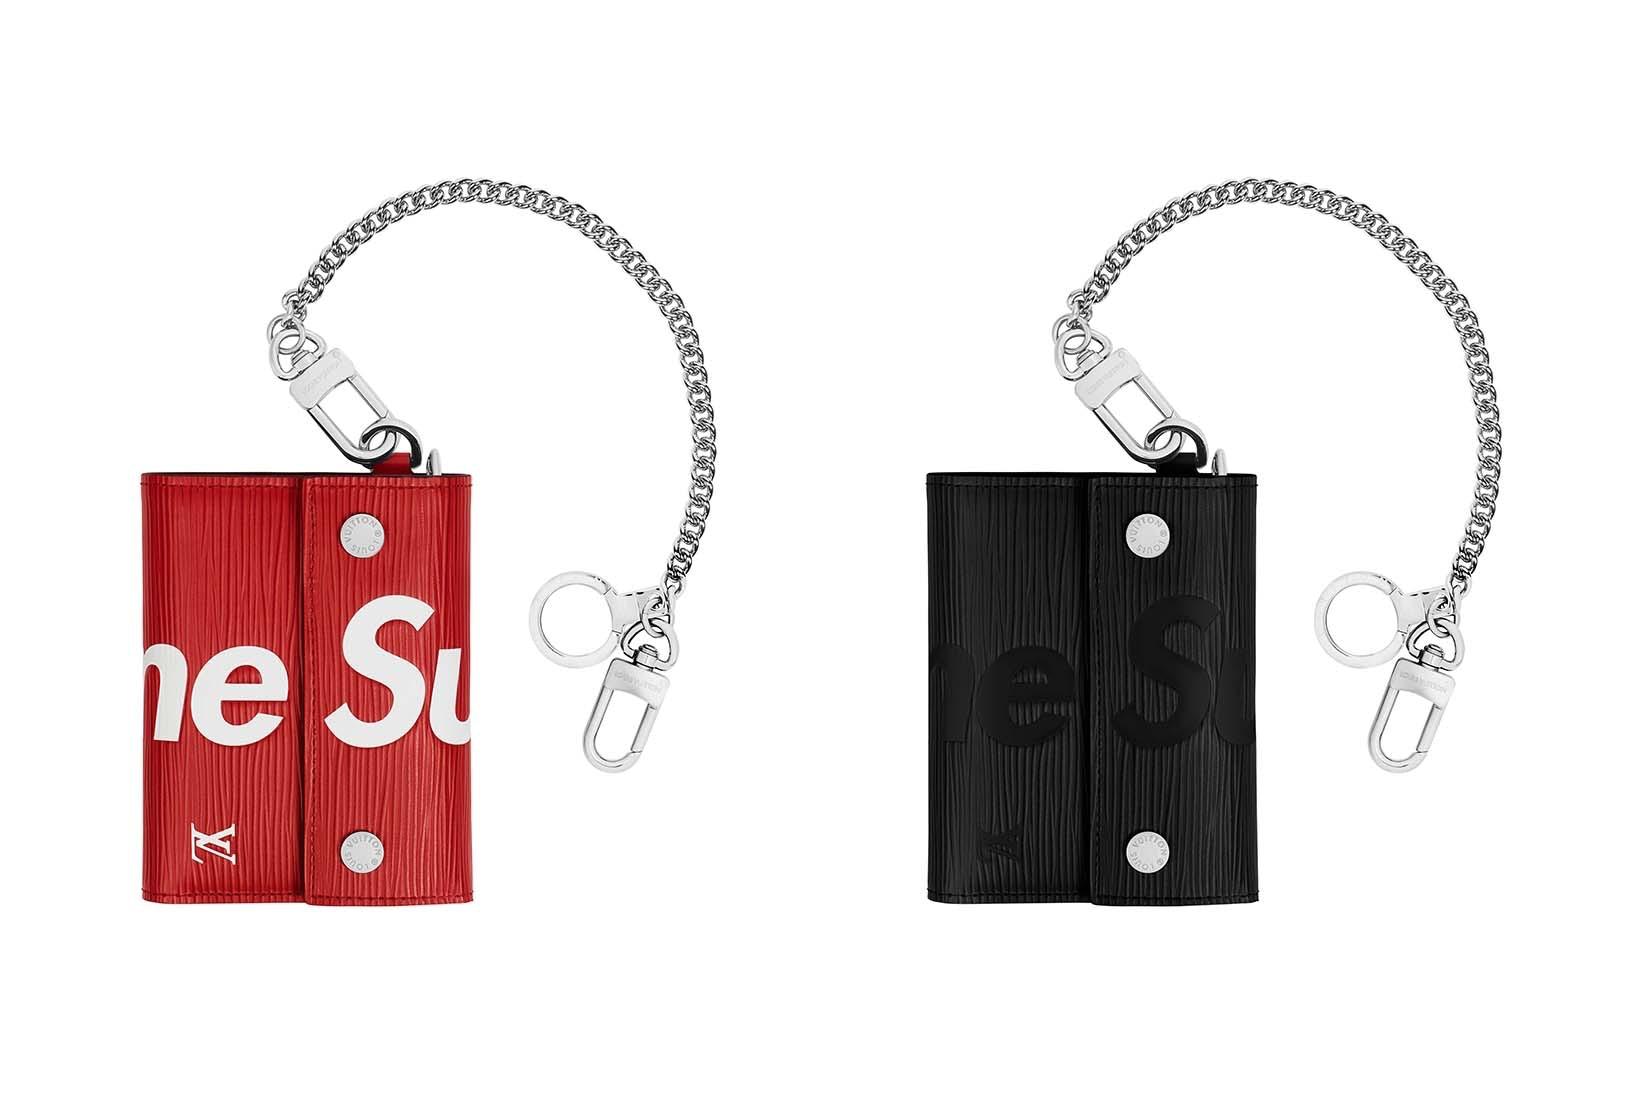 Supreme(シュプリーム)×Louis Vuitton(ルイ・ヴィトン) / コイン ウォレット(Chain Wallet)